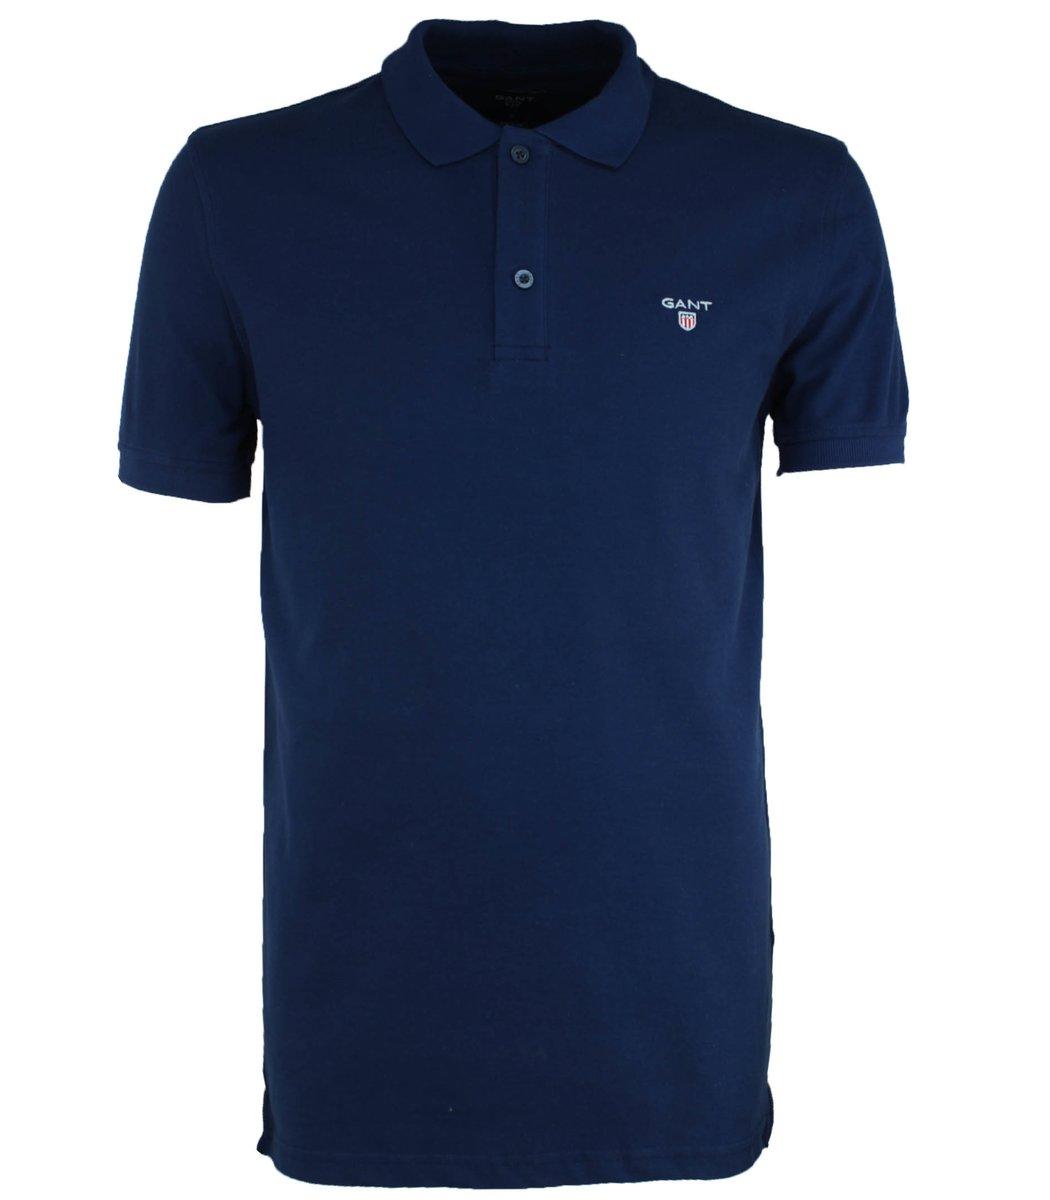 Тёмно-синяя классическая футболка поло Gant G2